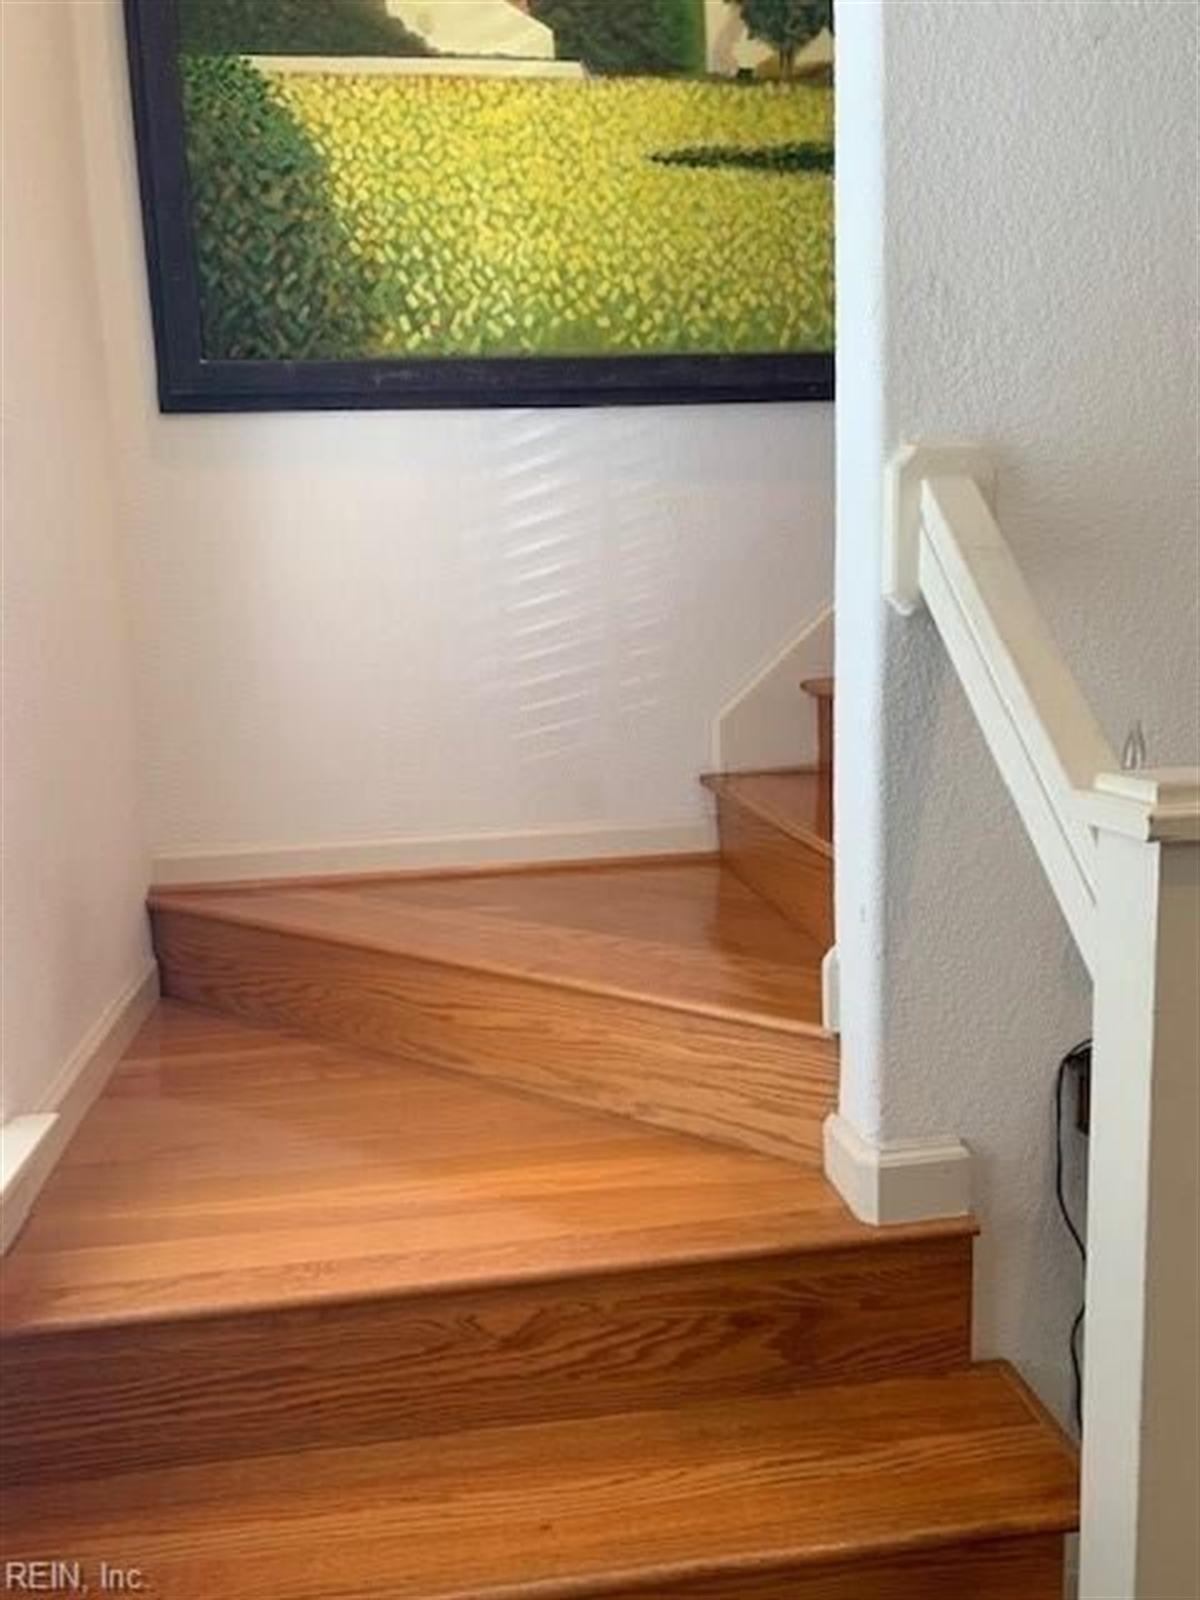 Real Estate Photography - 3779 Jefferson Blvd, Virginia Beach, VA, 23455 - Location 24